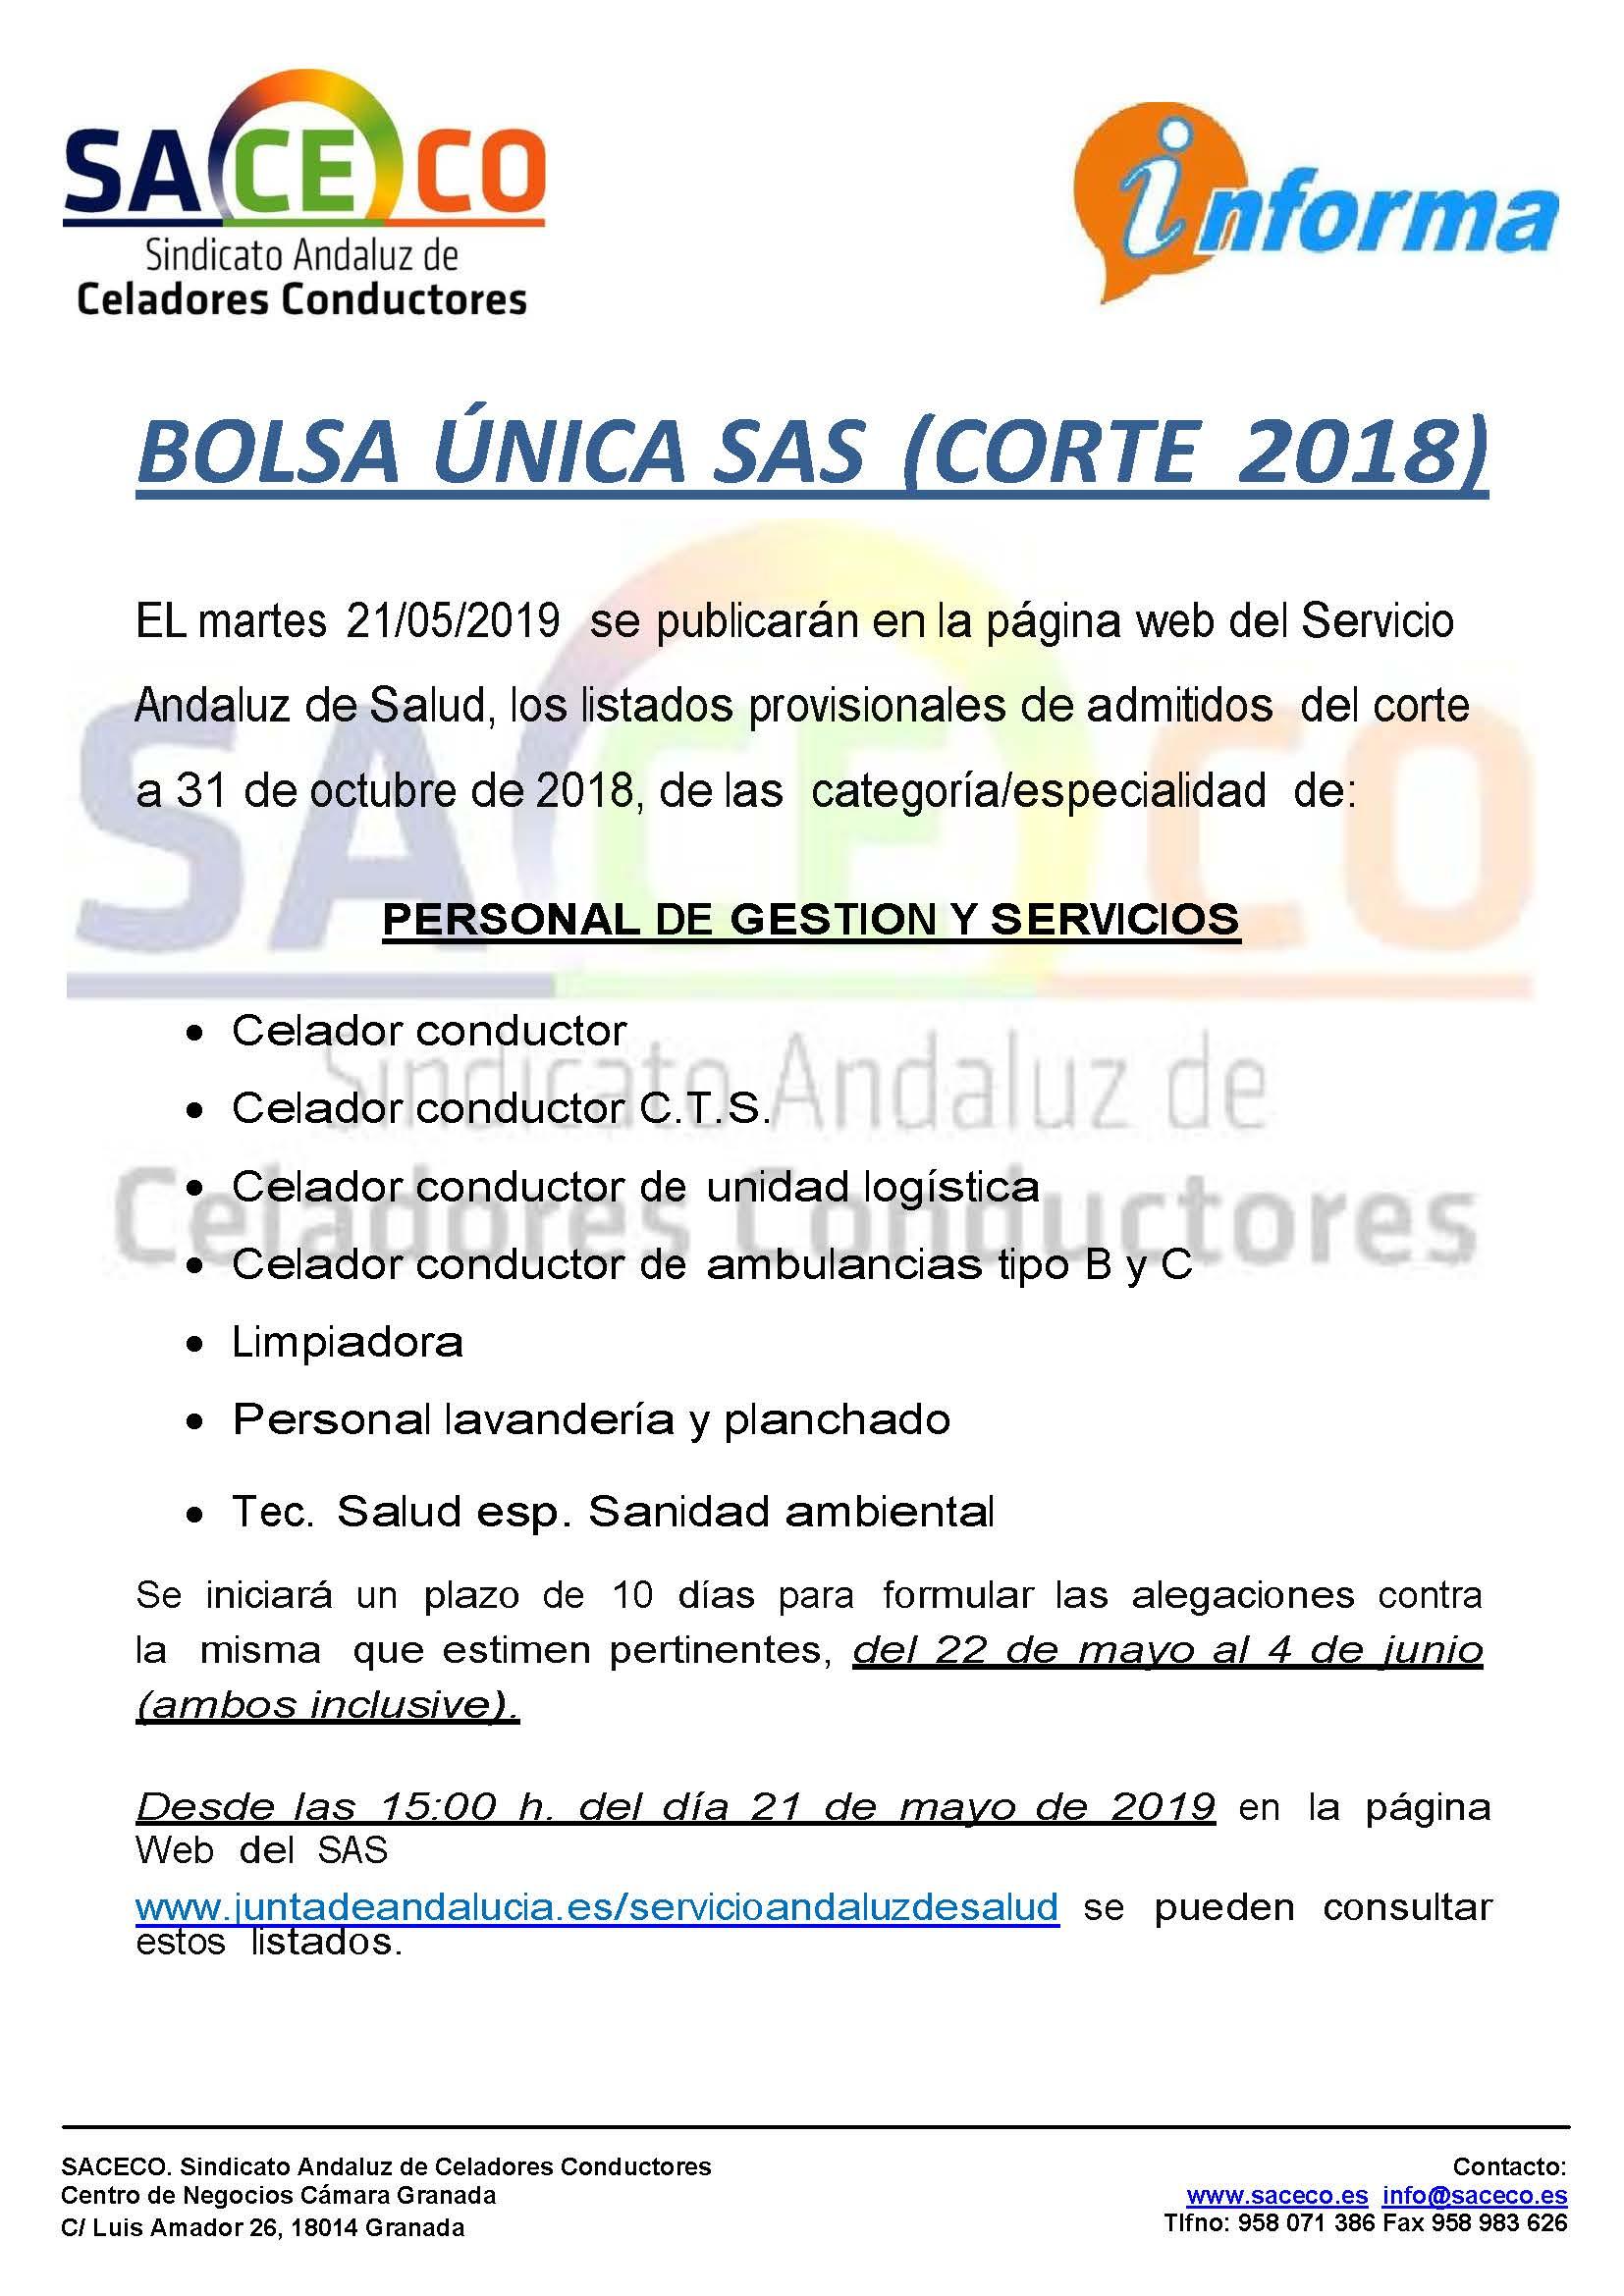 BOLSA ÚNICA SAS (CORTE 2018)